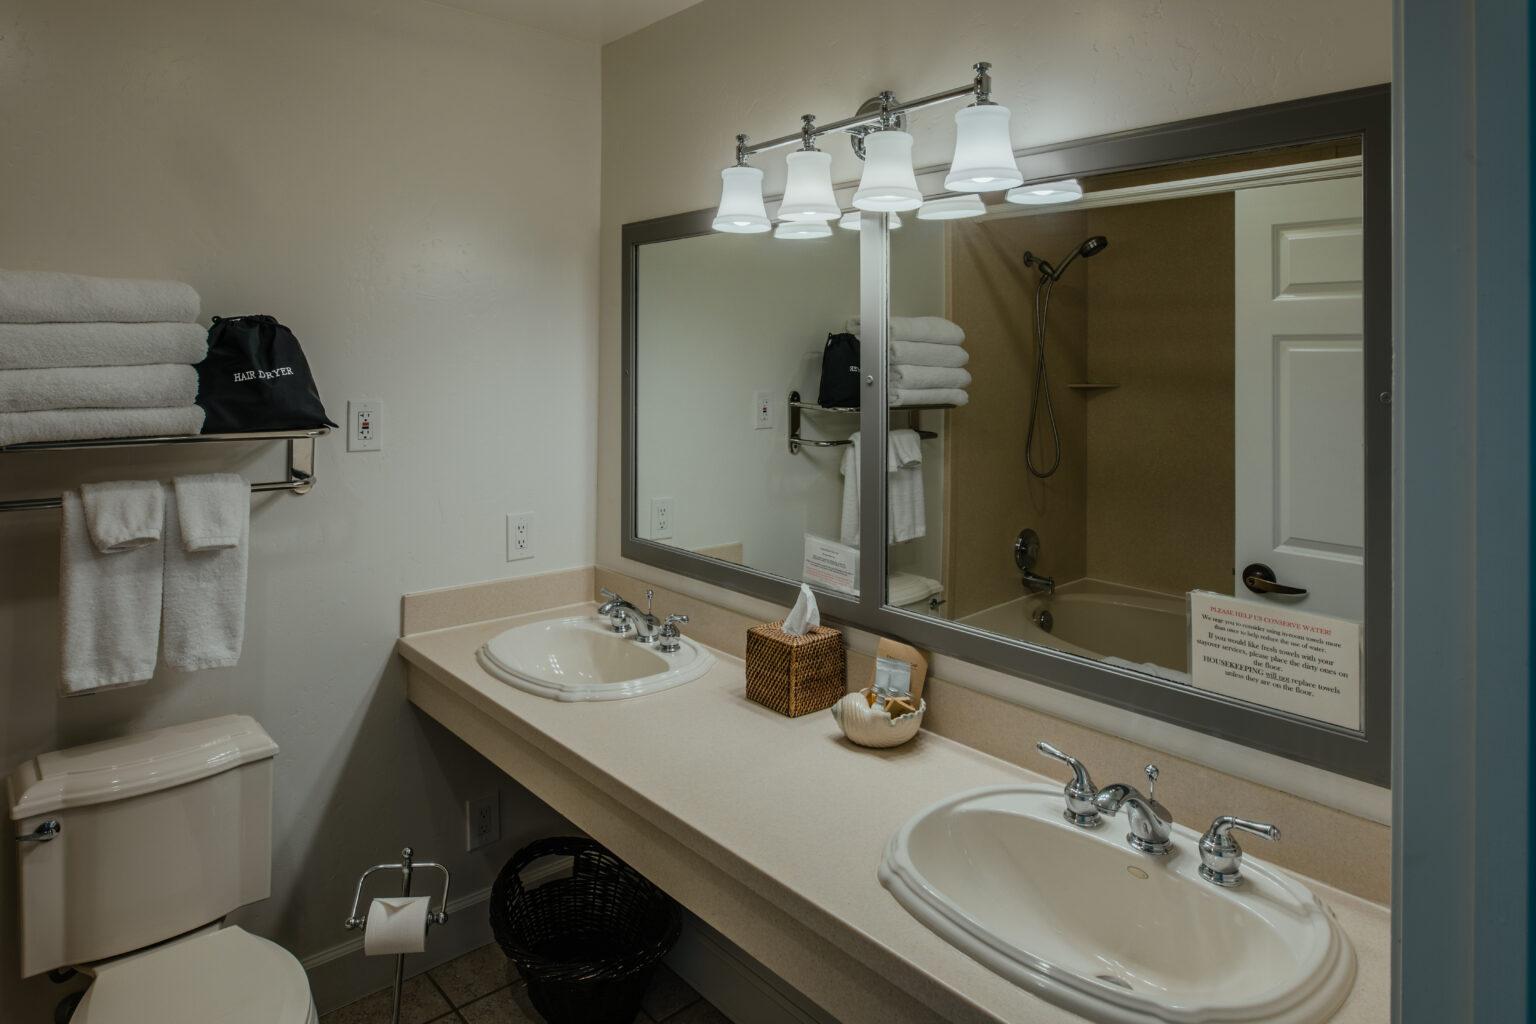 Room 201 Bathroom view